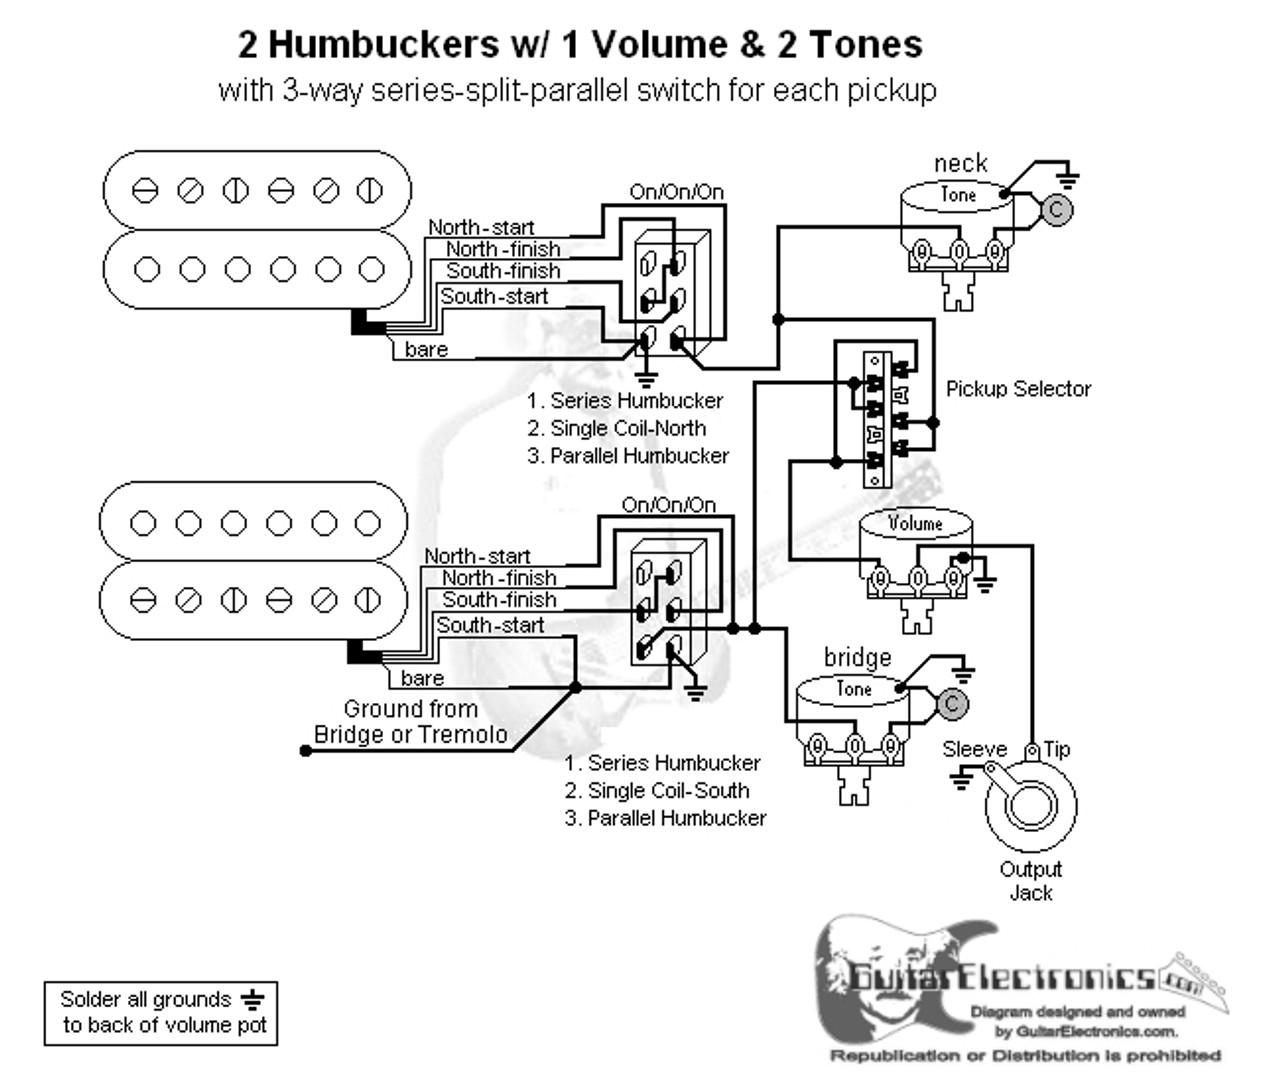 Wiring Diagram 2 Humbuckers 1 Volume Tone